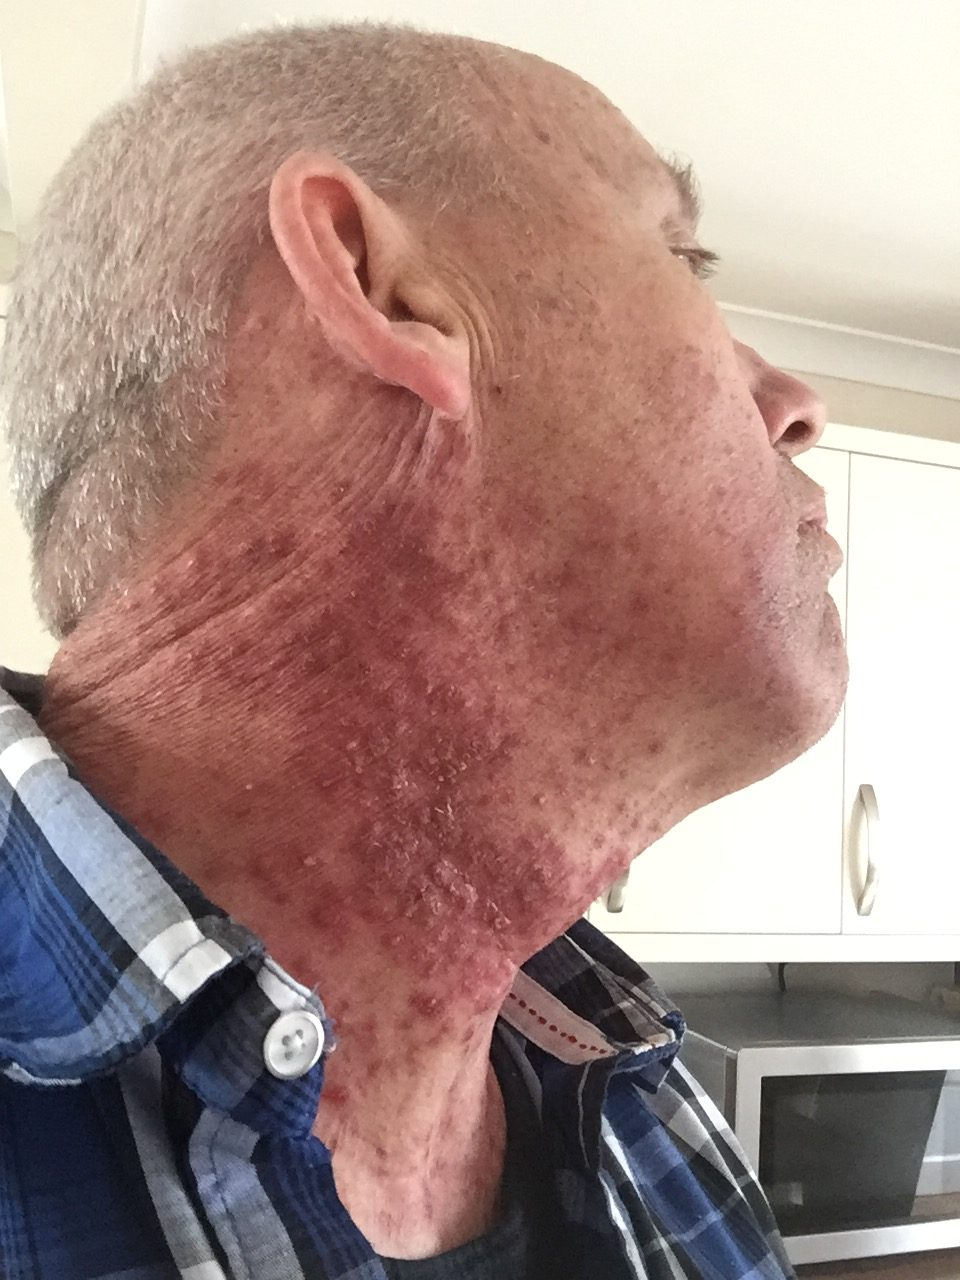 cancer hpv neck)